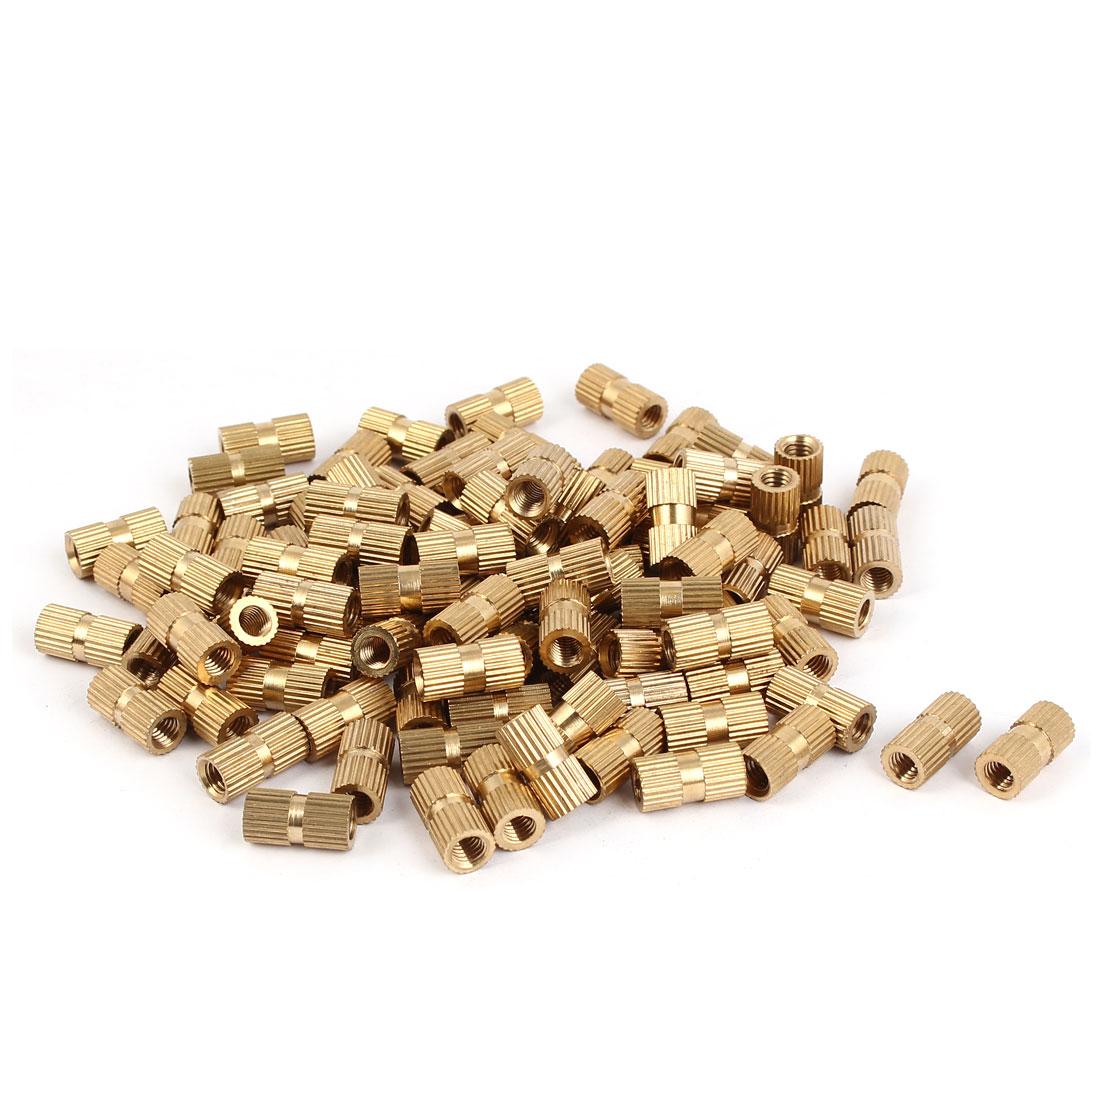 M5 x 14mm x 7.3mm Brass Knurled Threaded Round Insert Embedded Nuts 100PCS